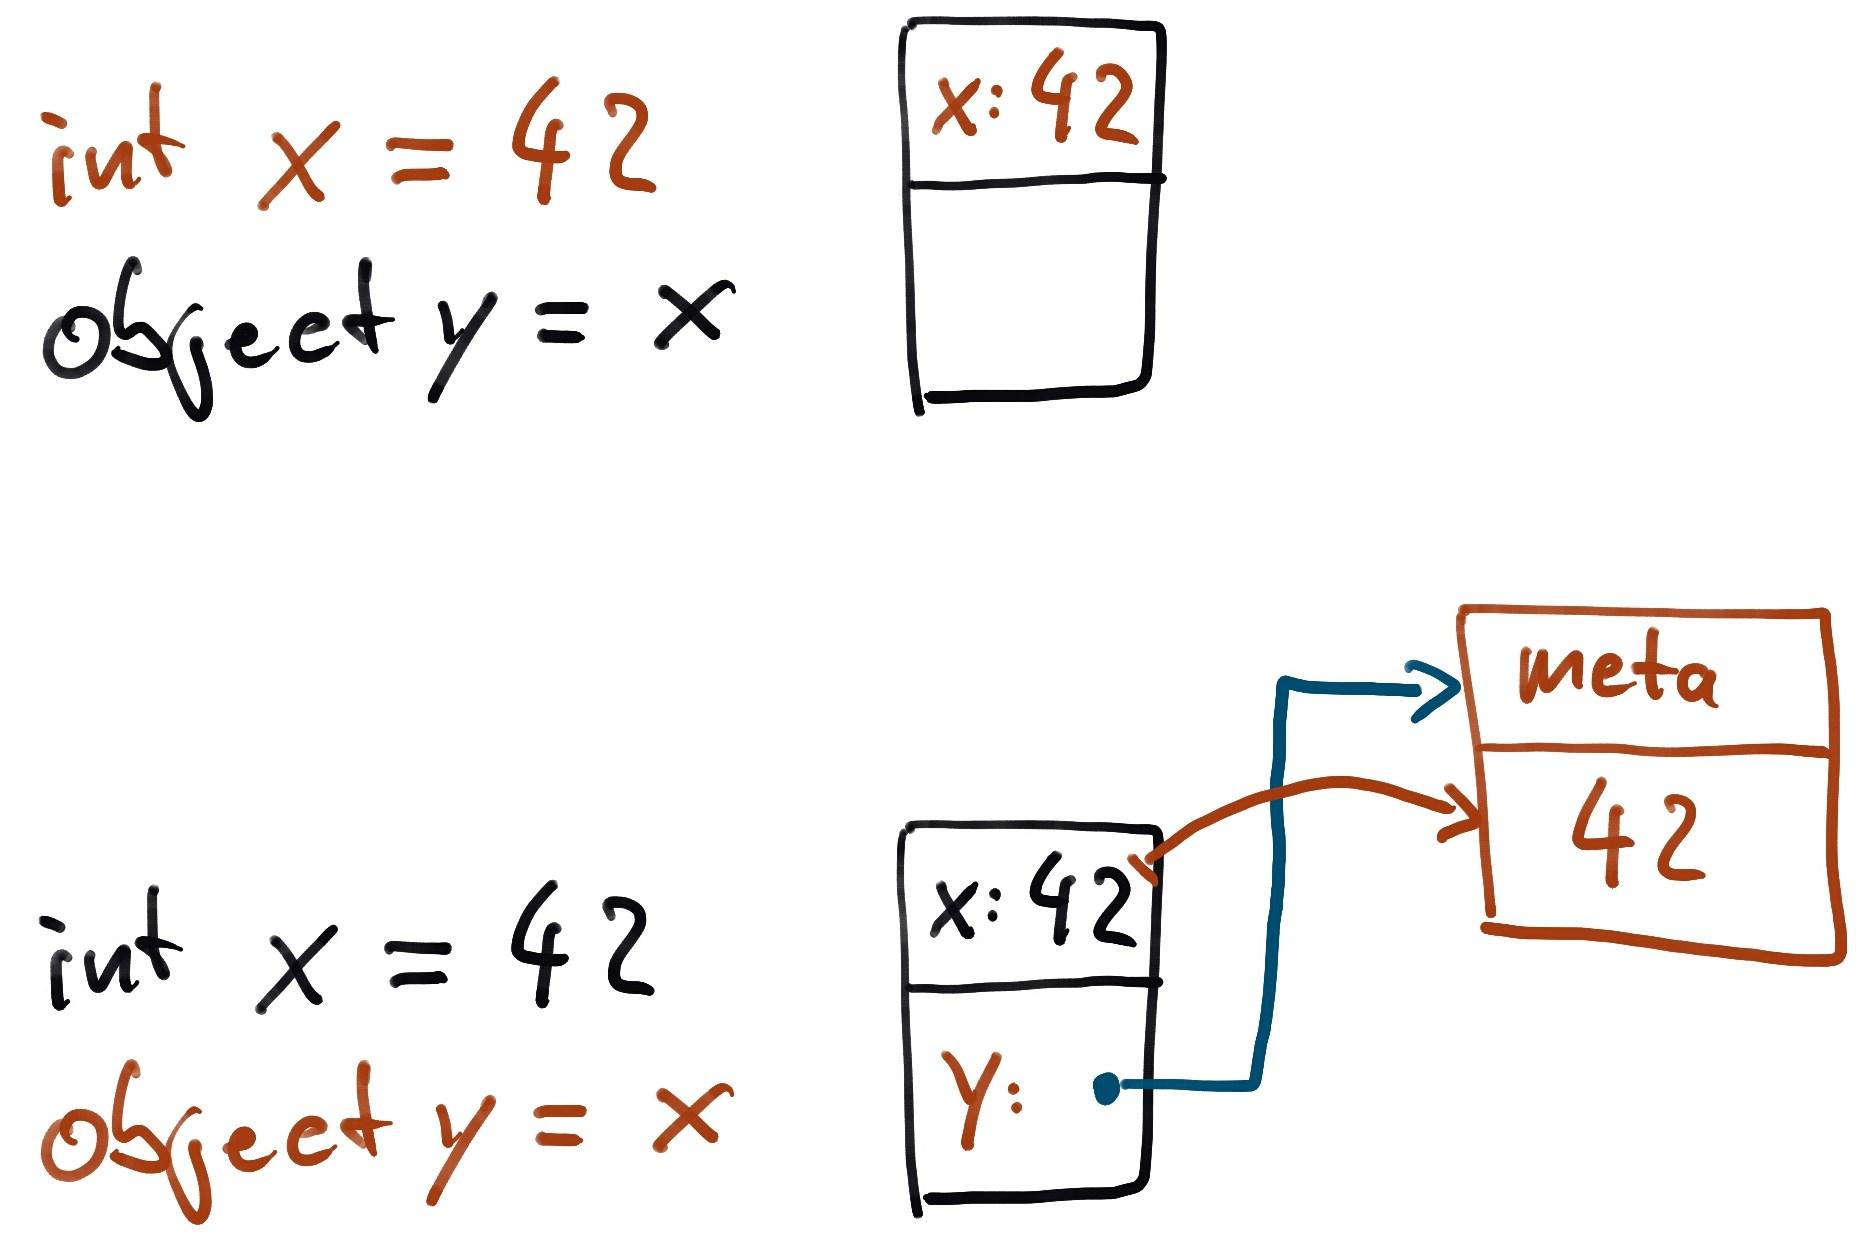 Value Semantics and C# structs